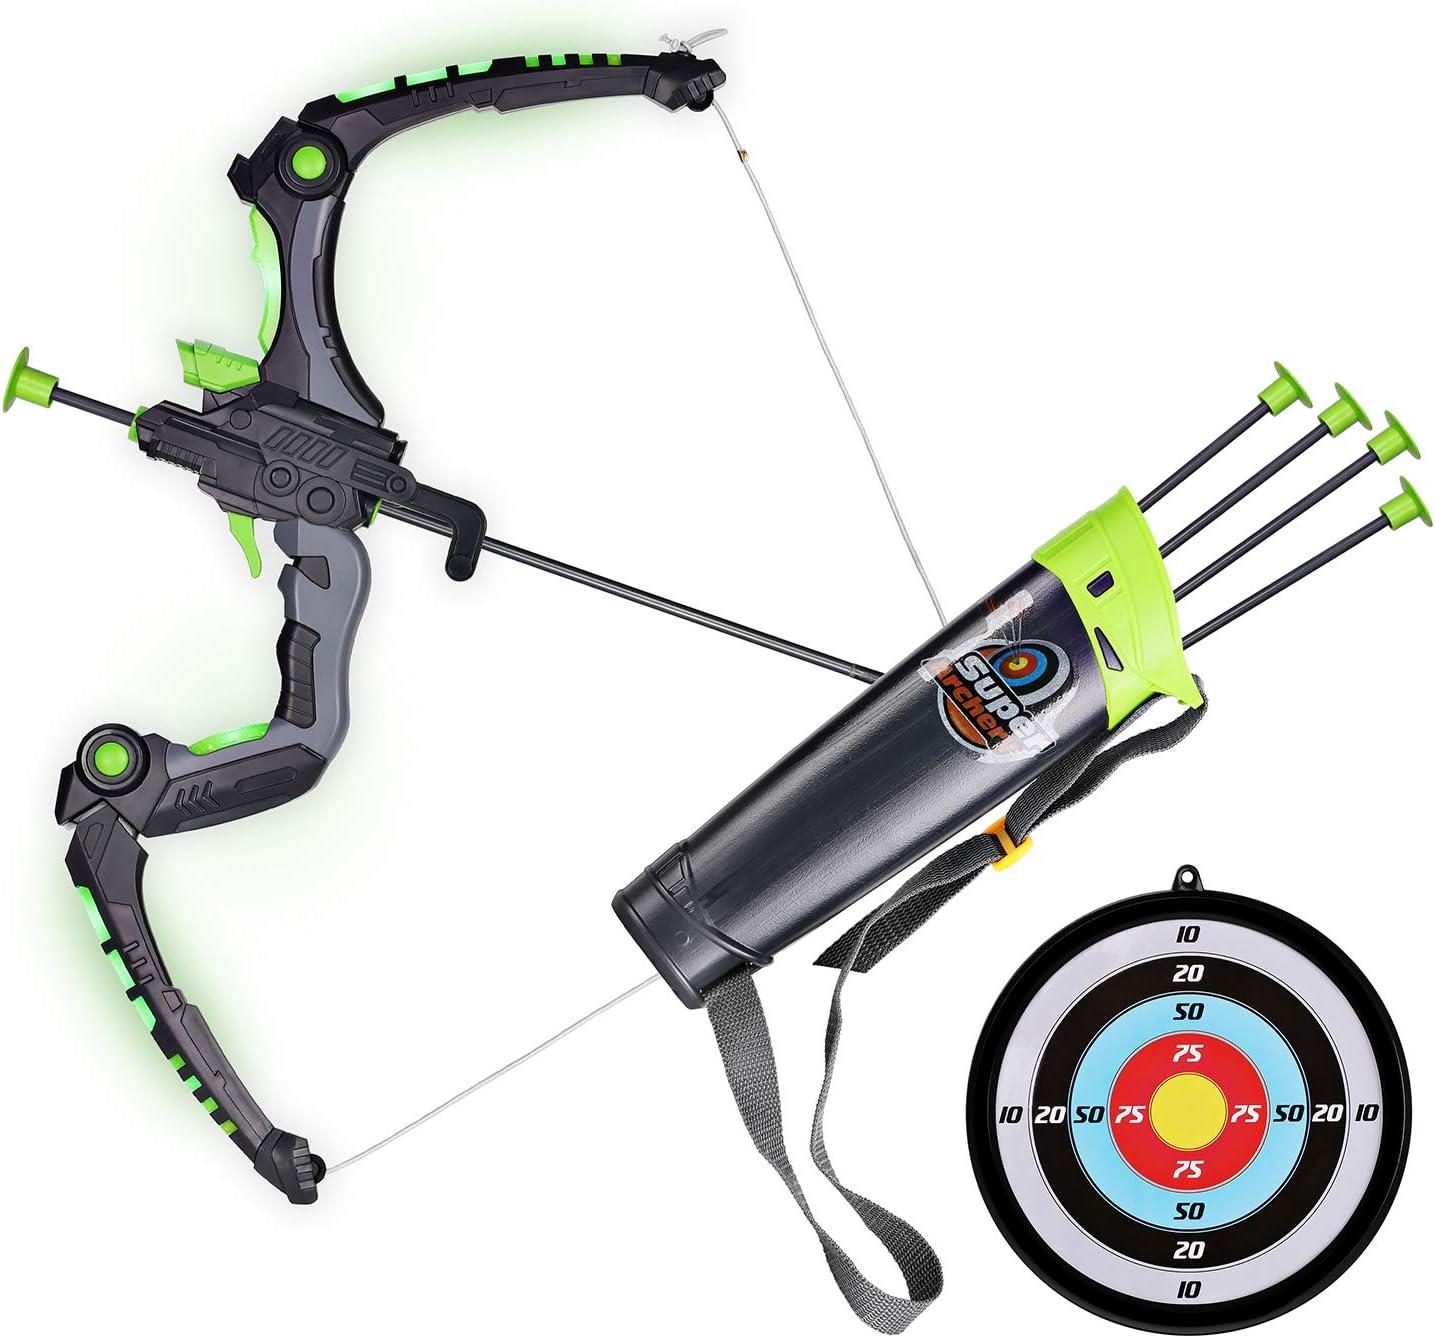 SainSmart Jr. Kids Bow and Arrows for Manufacturer direct delivery Up Set Archery Light Max 57% OFF